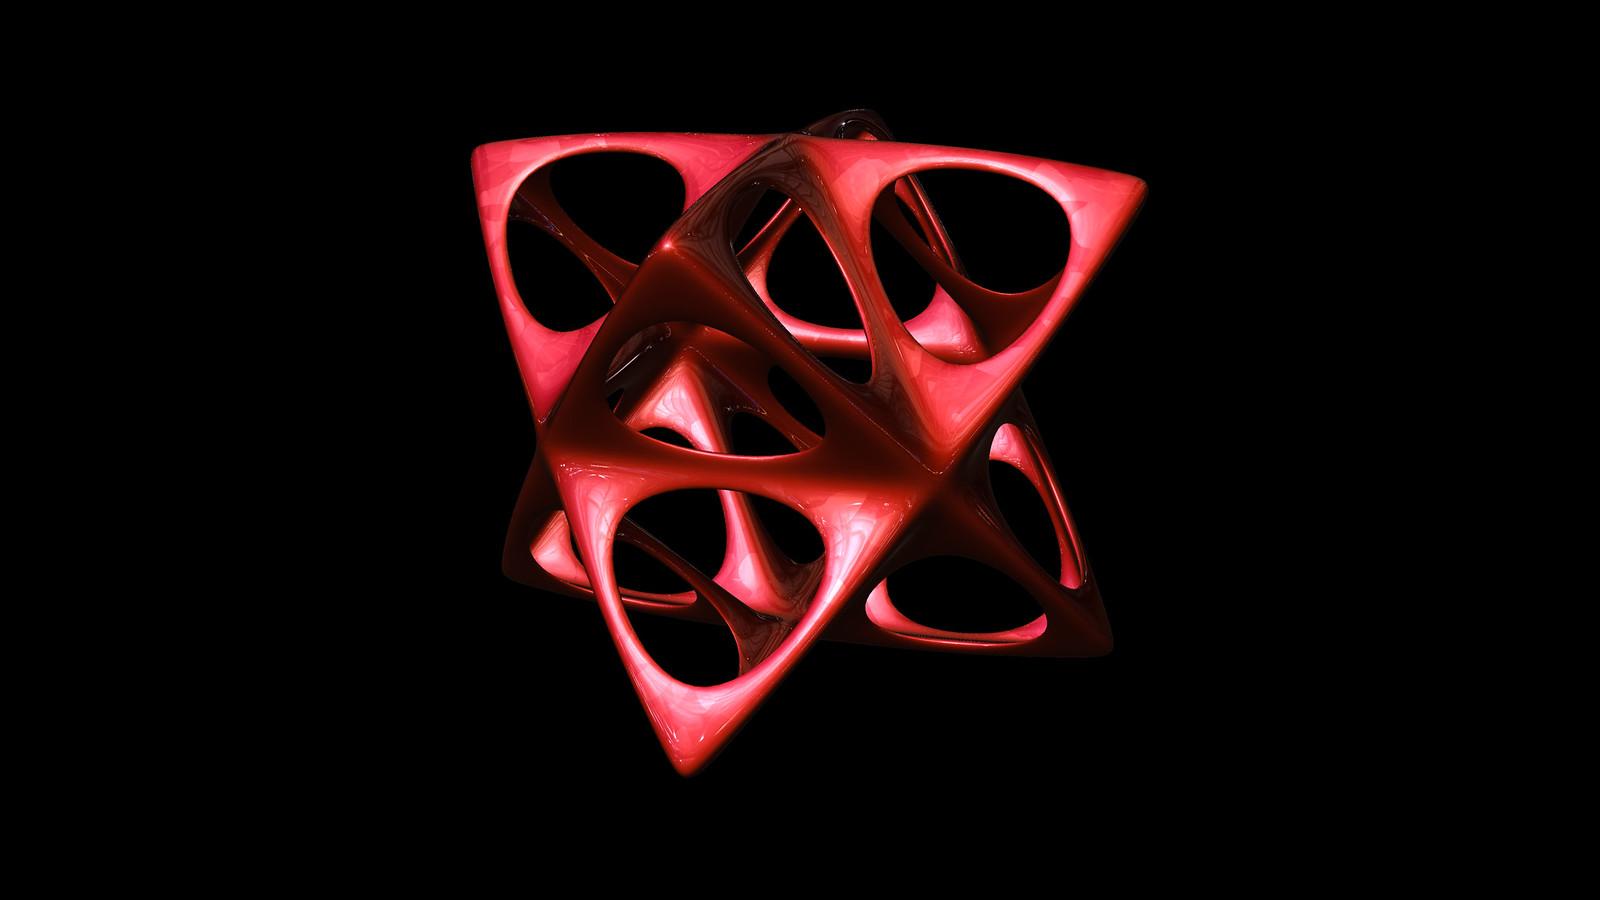 octahedron spiky soft